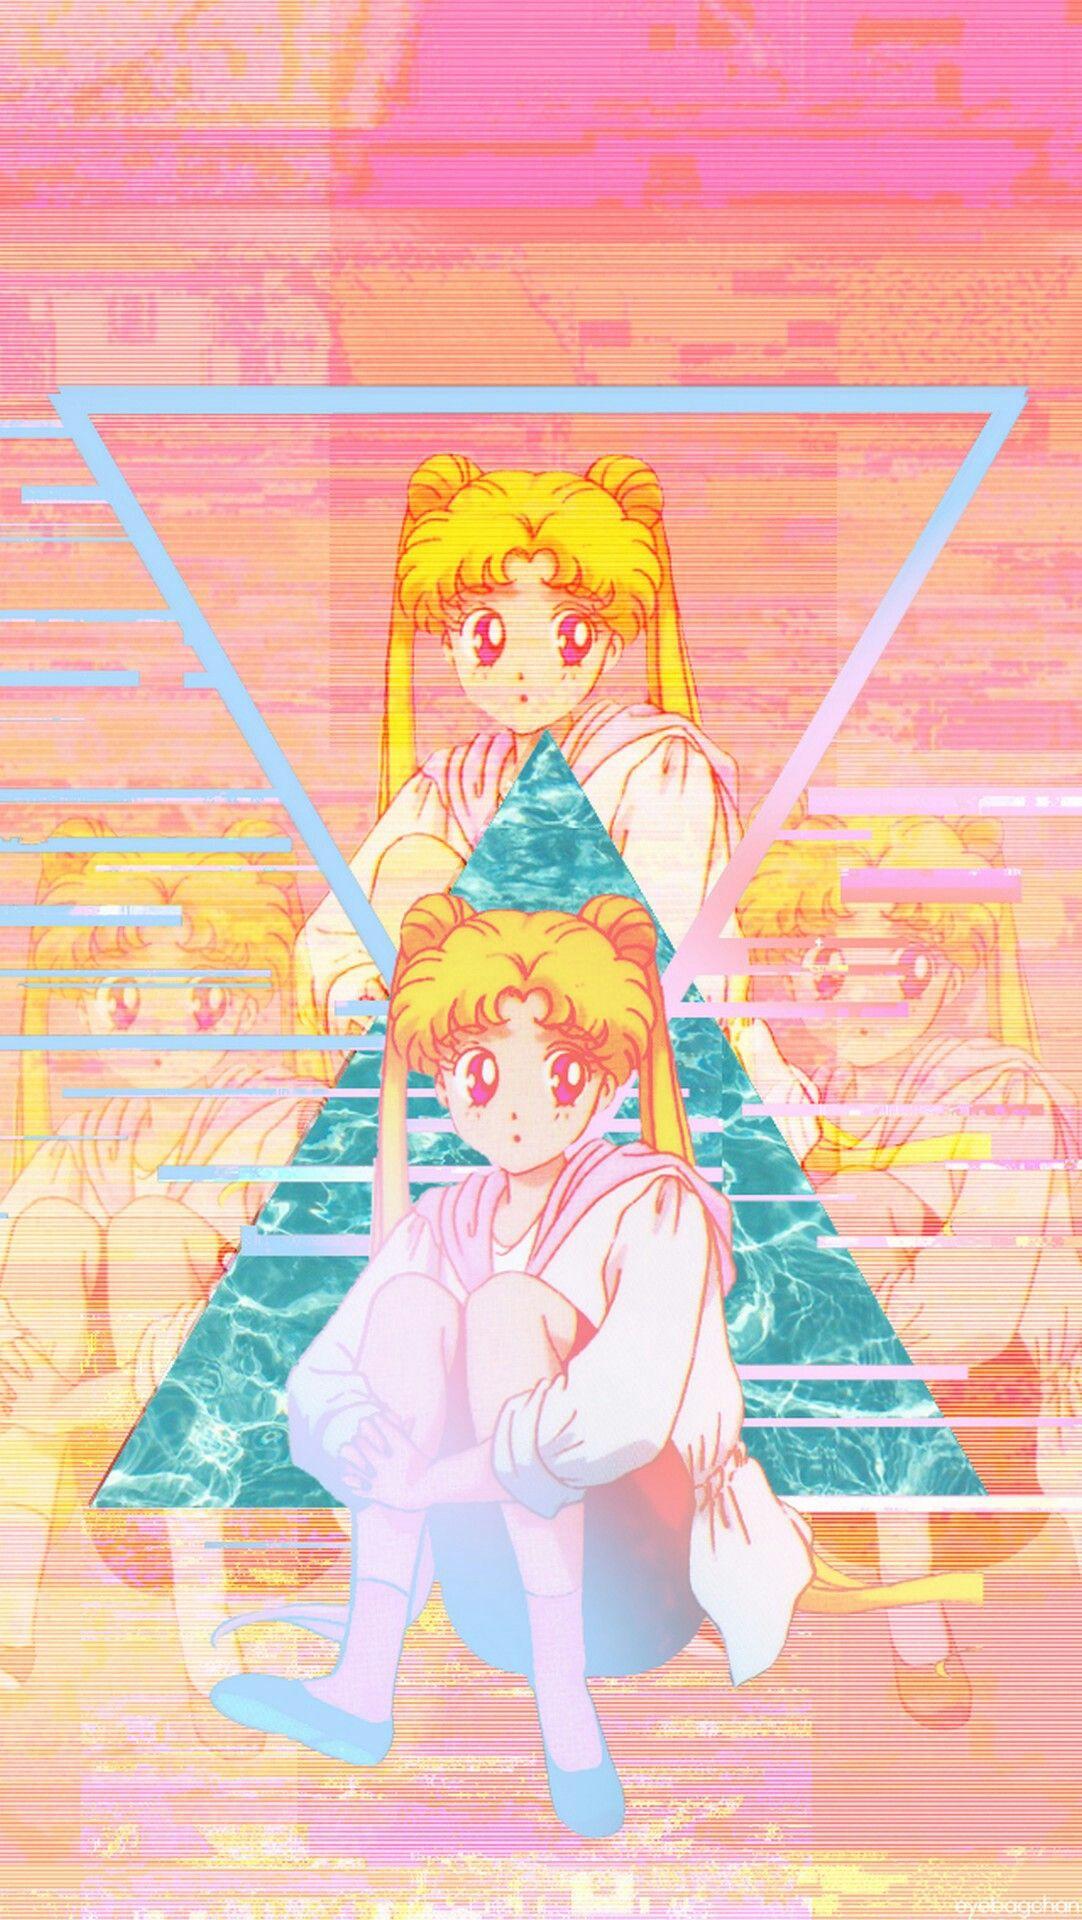 AESTHETIC VAPORWAVE ANIME IMAGE 🍒   Aesthetic anime, Anime ...